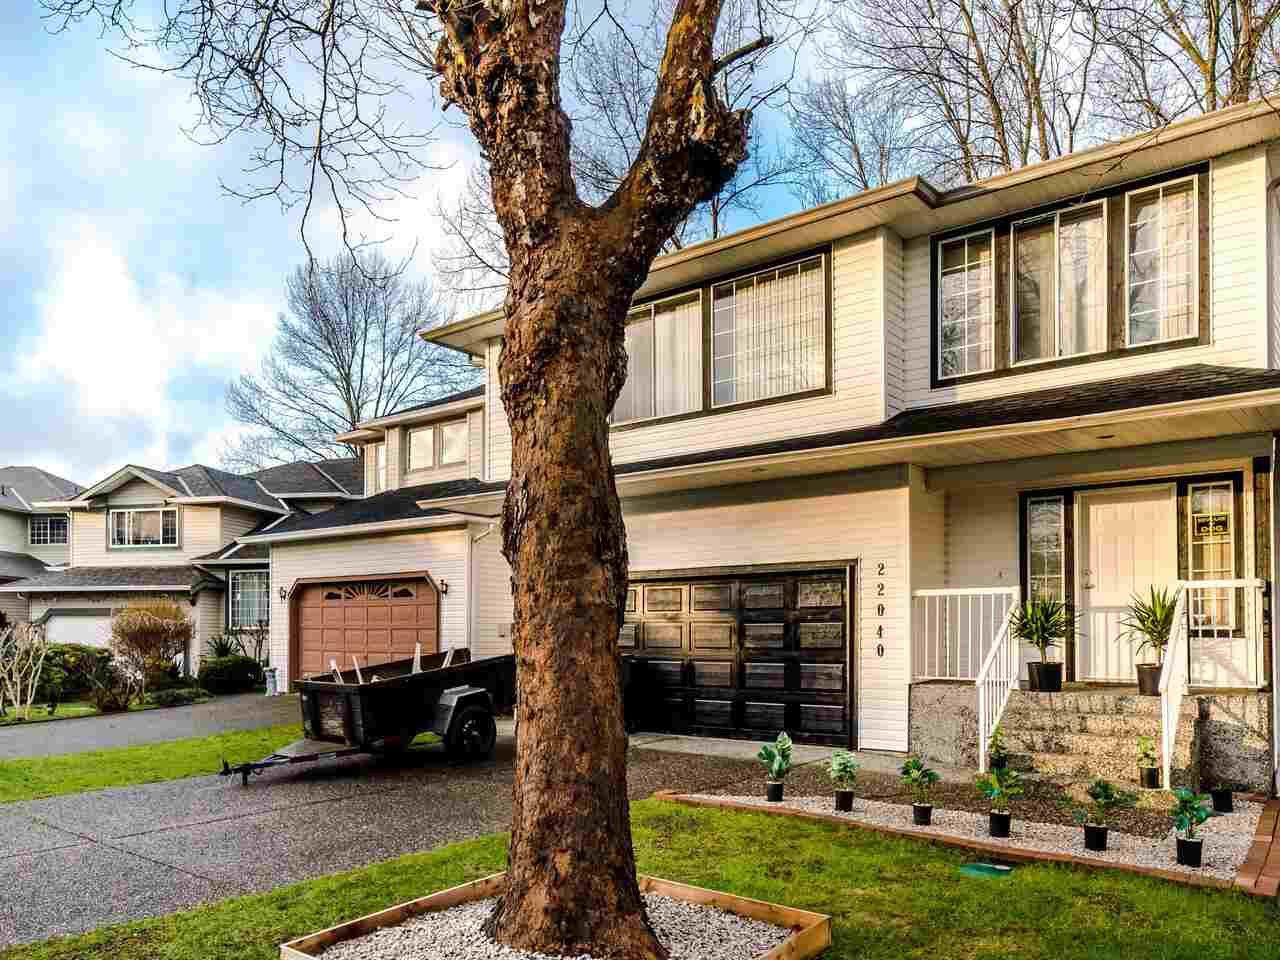 Main Photo: 22040 CHALDECOTT Drive in Richmond: Hamilton RI House for sale : MLS®# R2528415